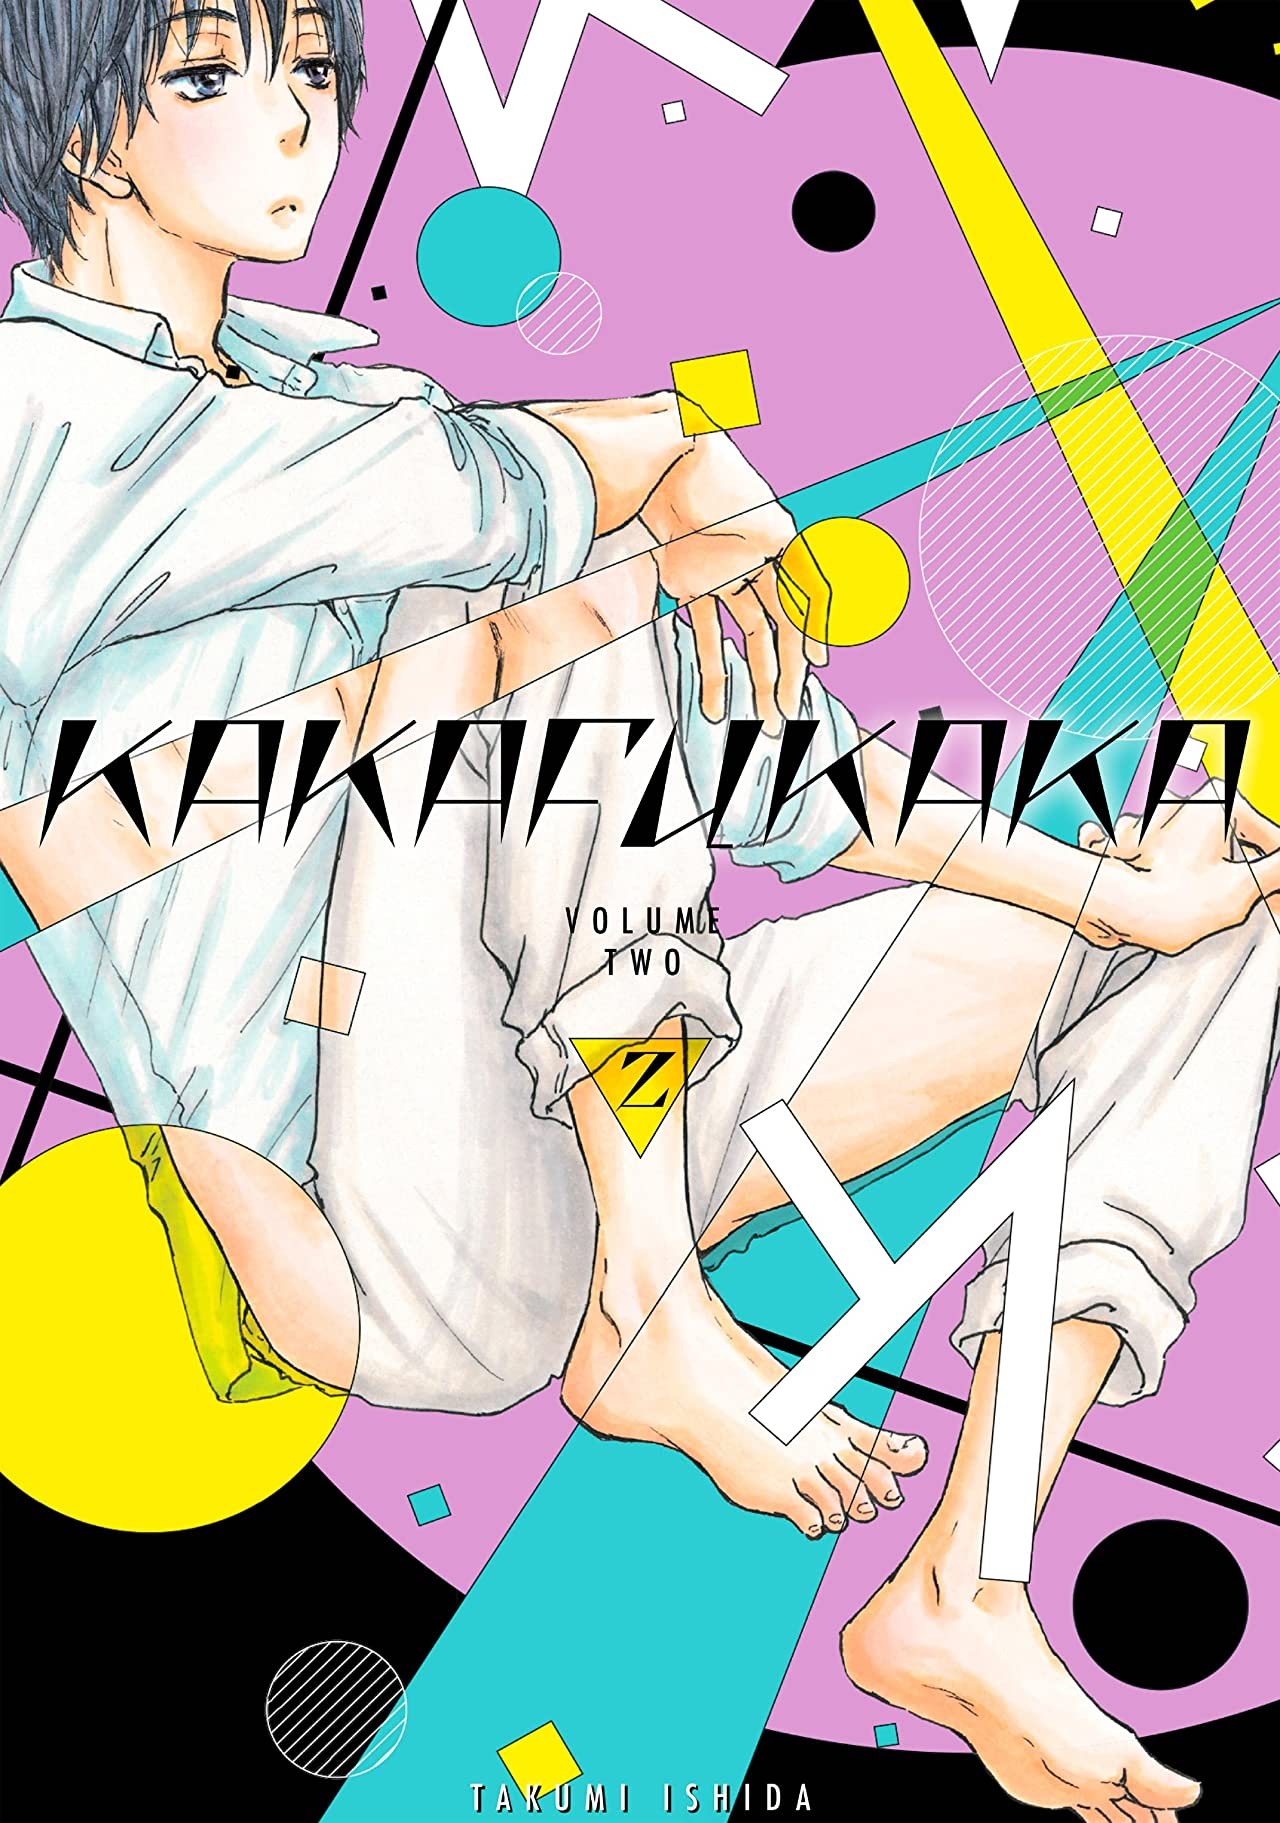 Kakafukaka Vol. 2